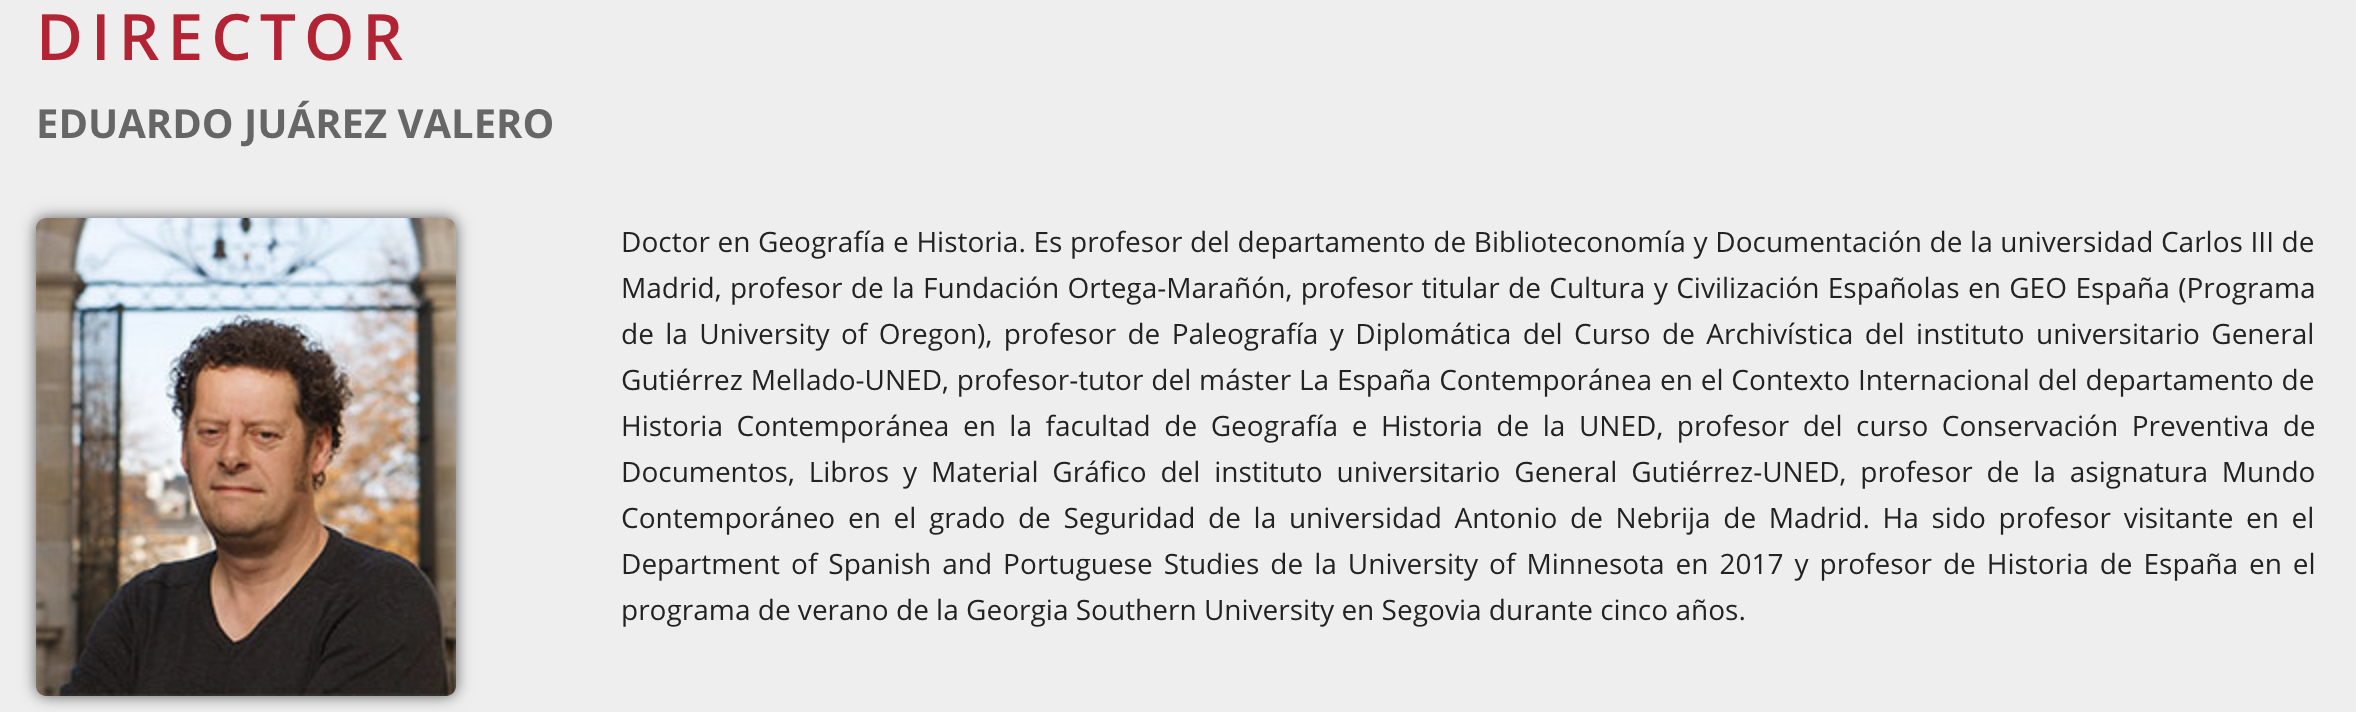 Escuela Internacional de Doctorado | INISEG 2018-12-18 19-10-42